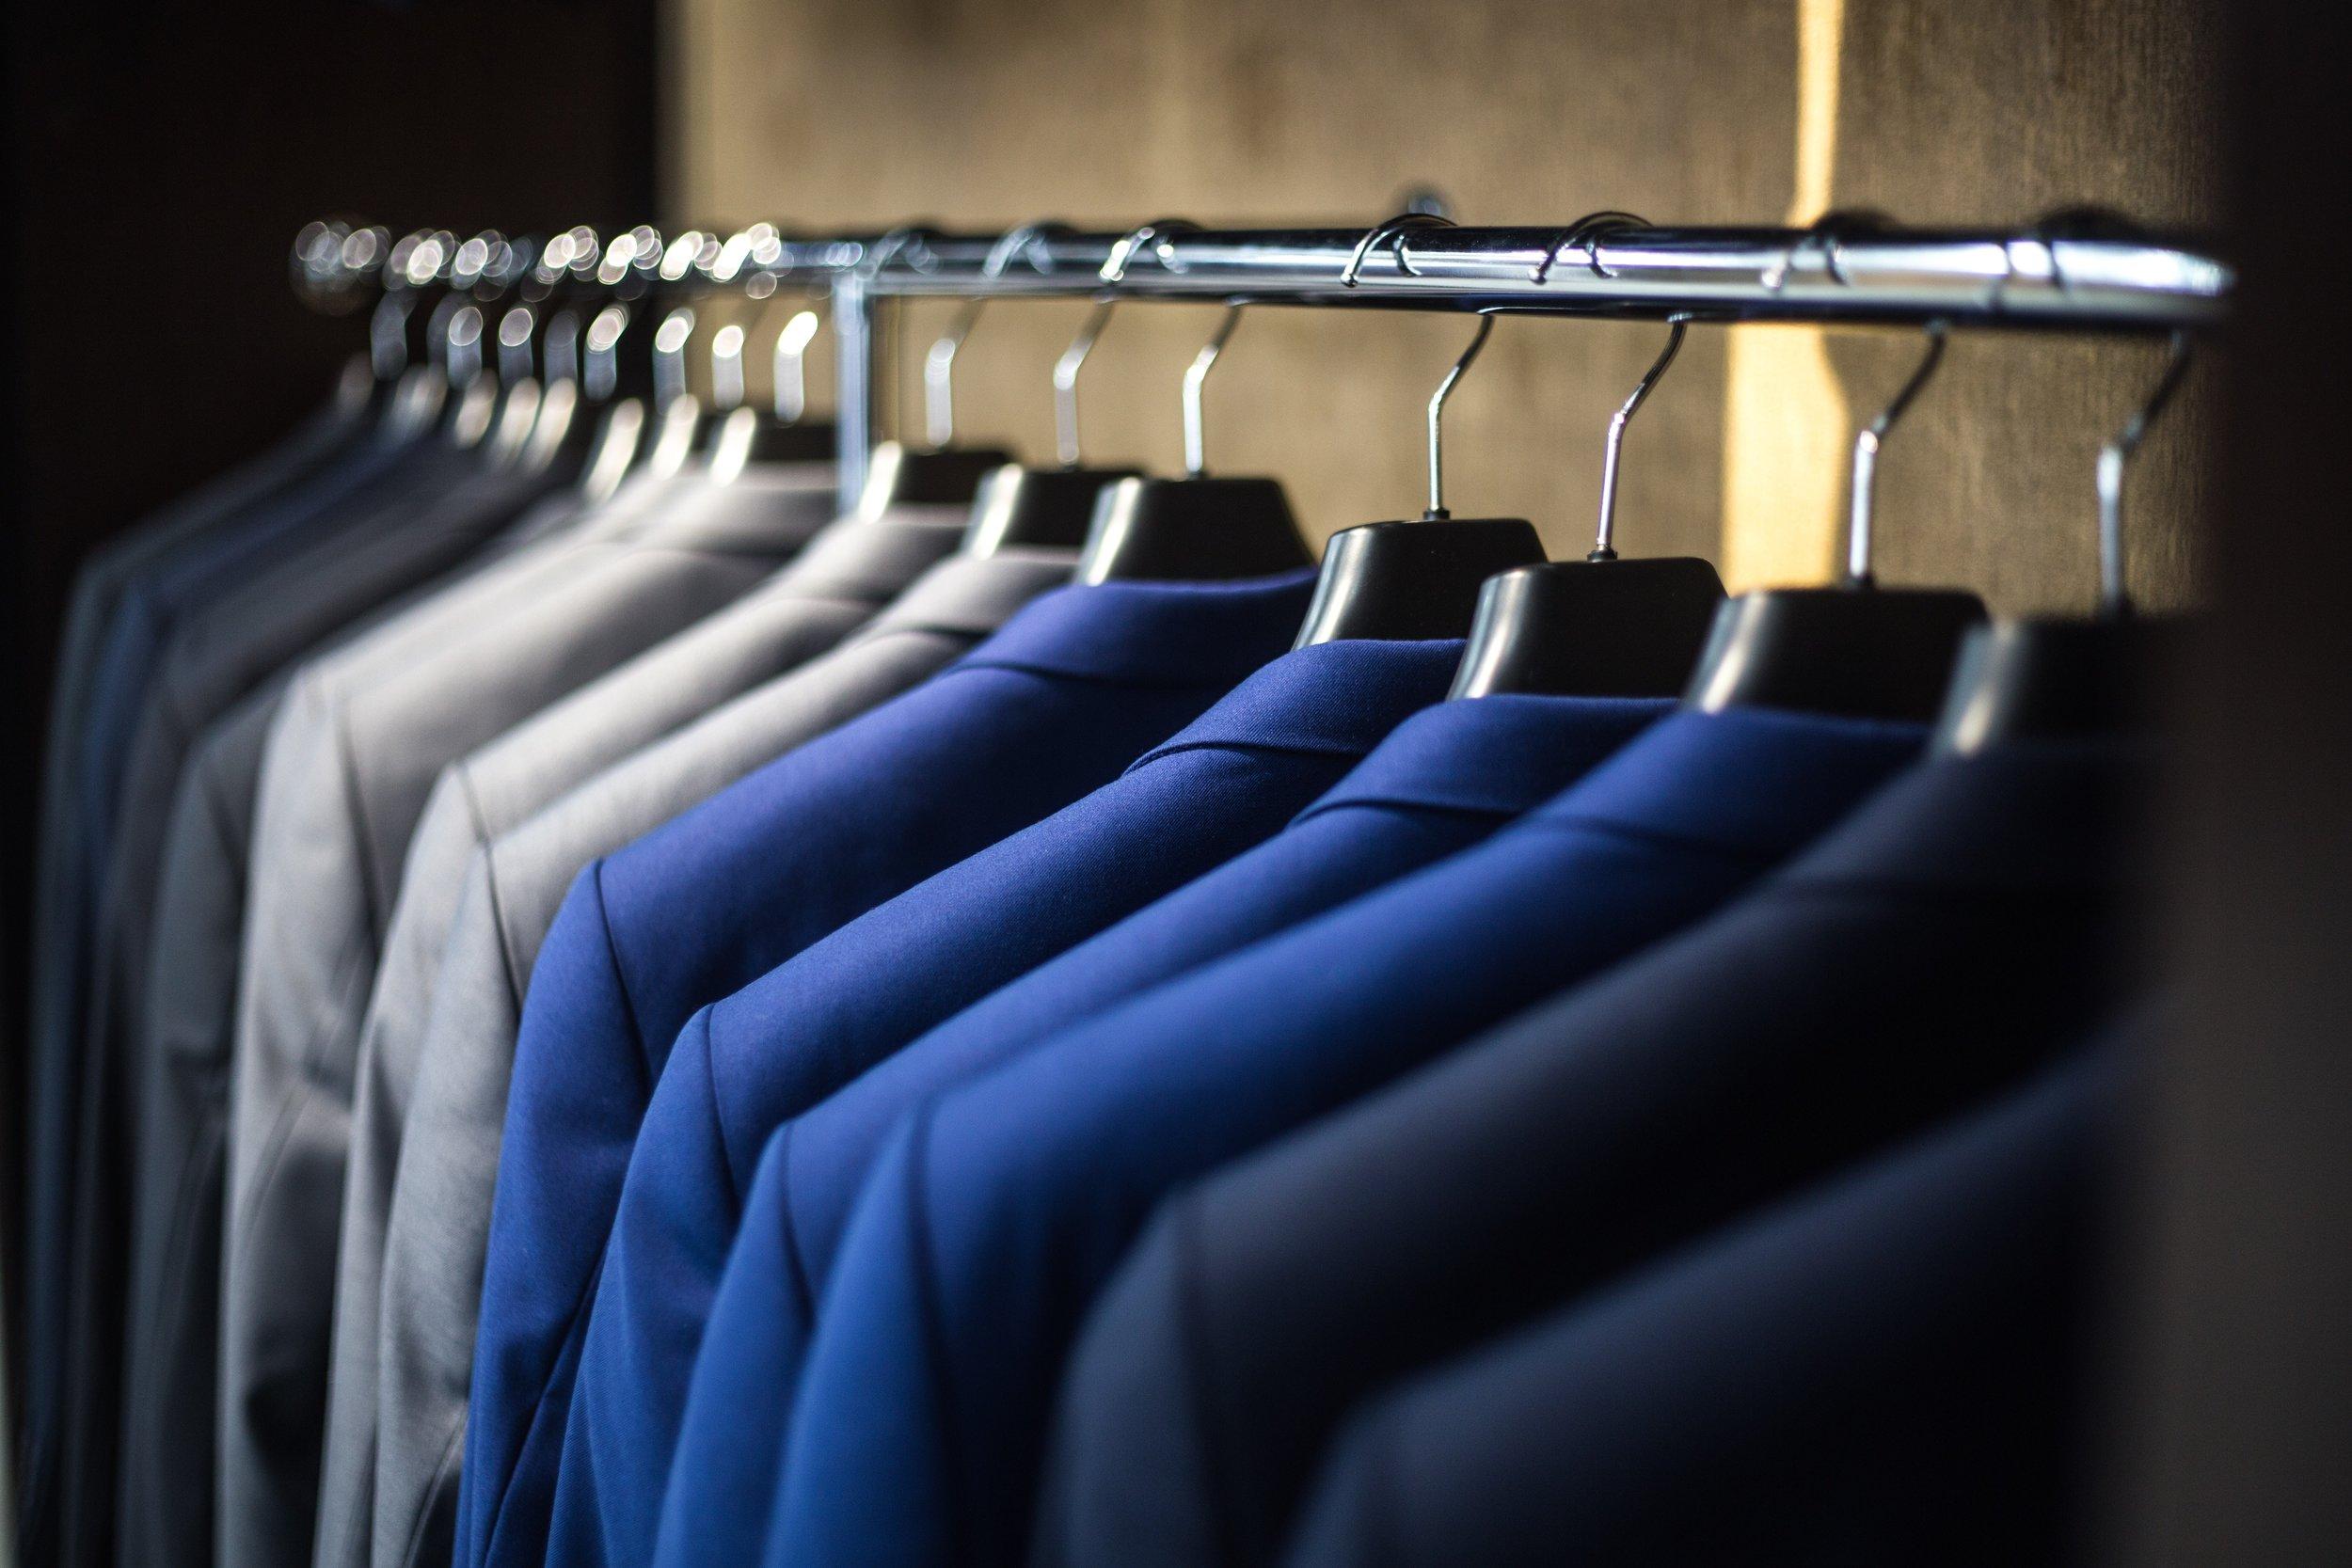 blur-business-clothes-325876.jpg